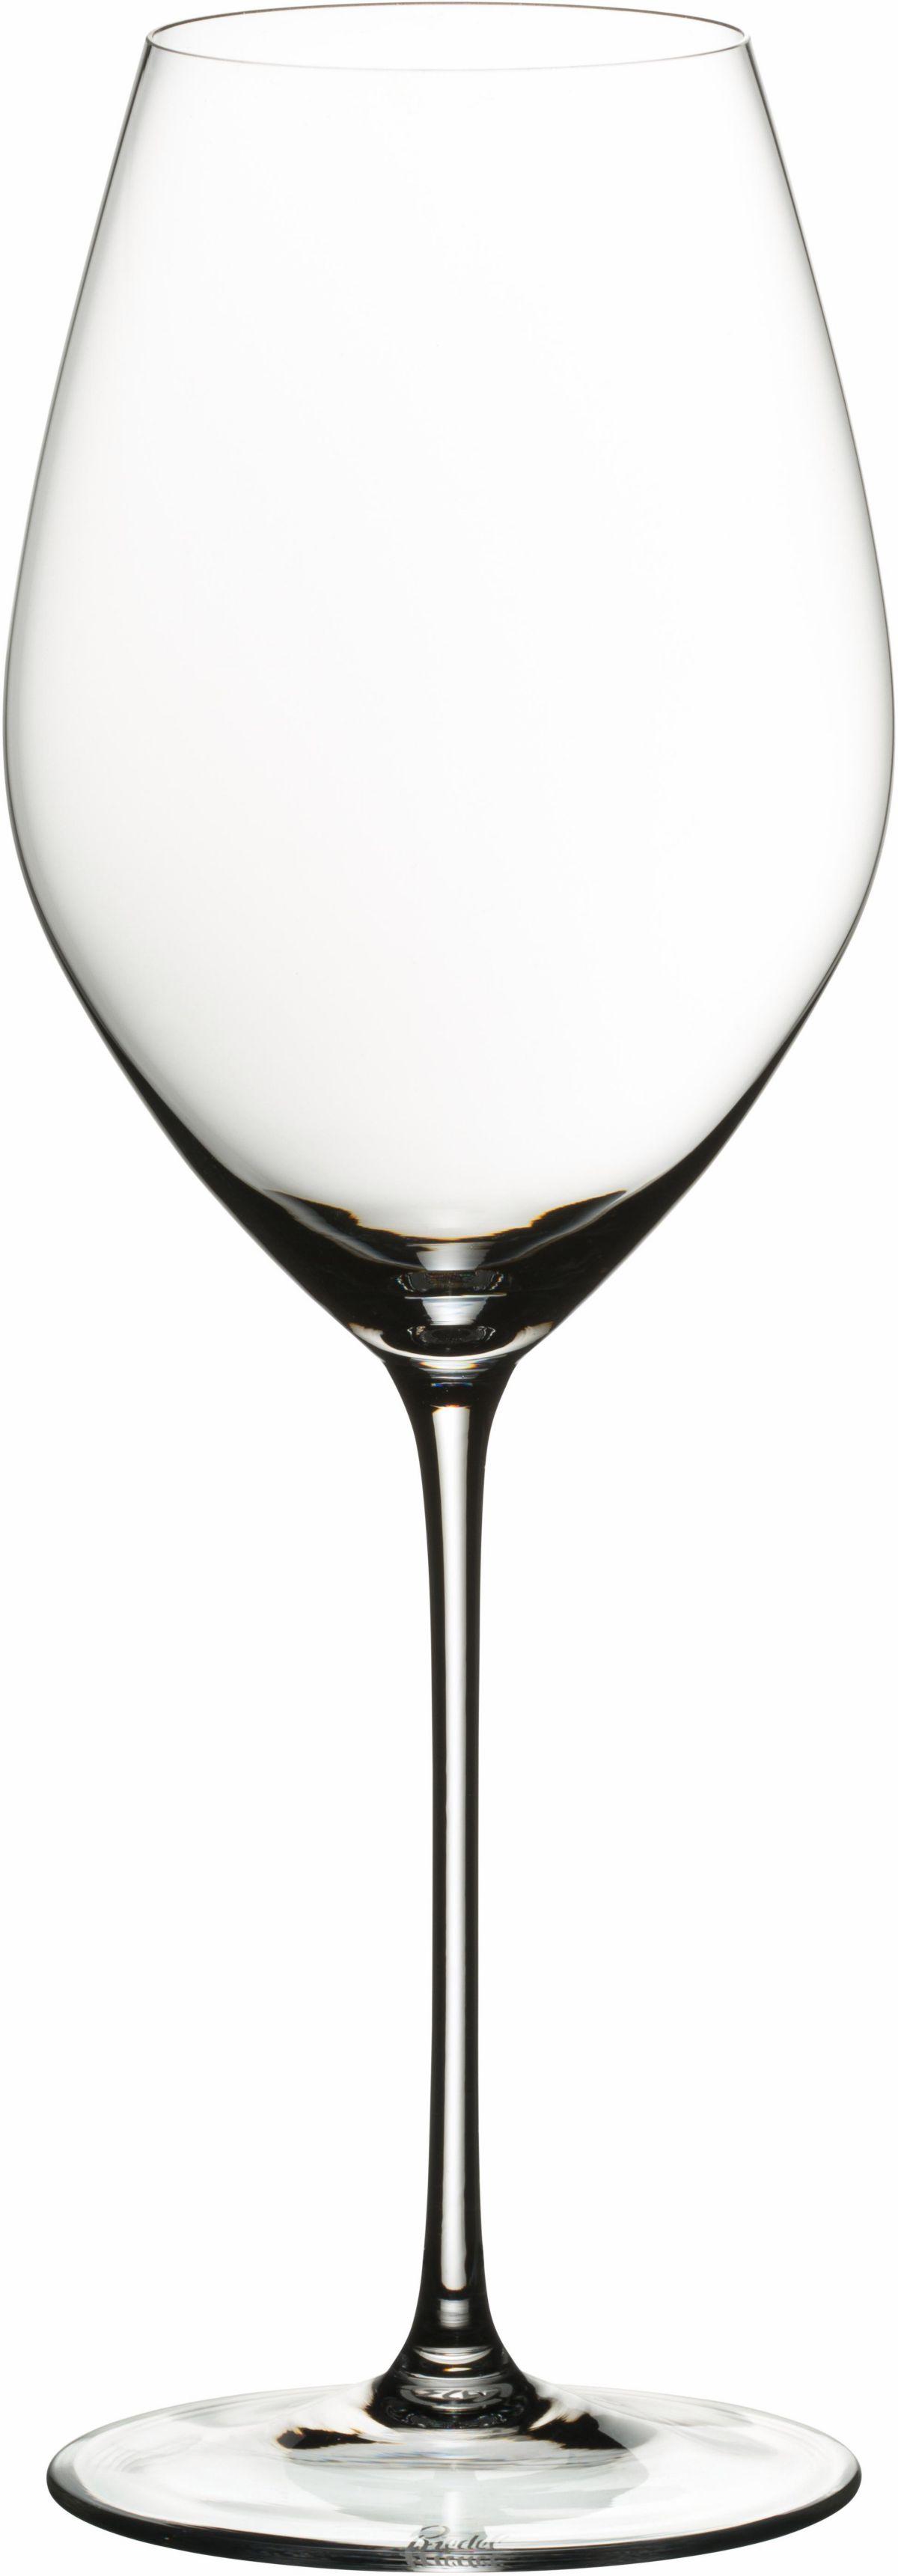 RIEDEL GLASS Wein-Glas, Champagner, 2er Set, Ma...